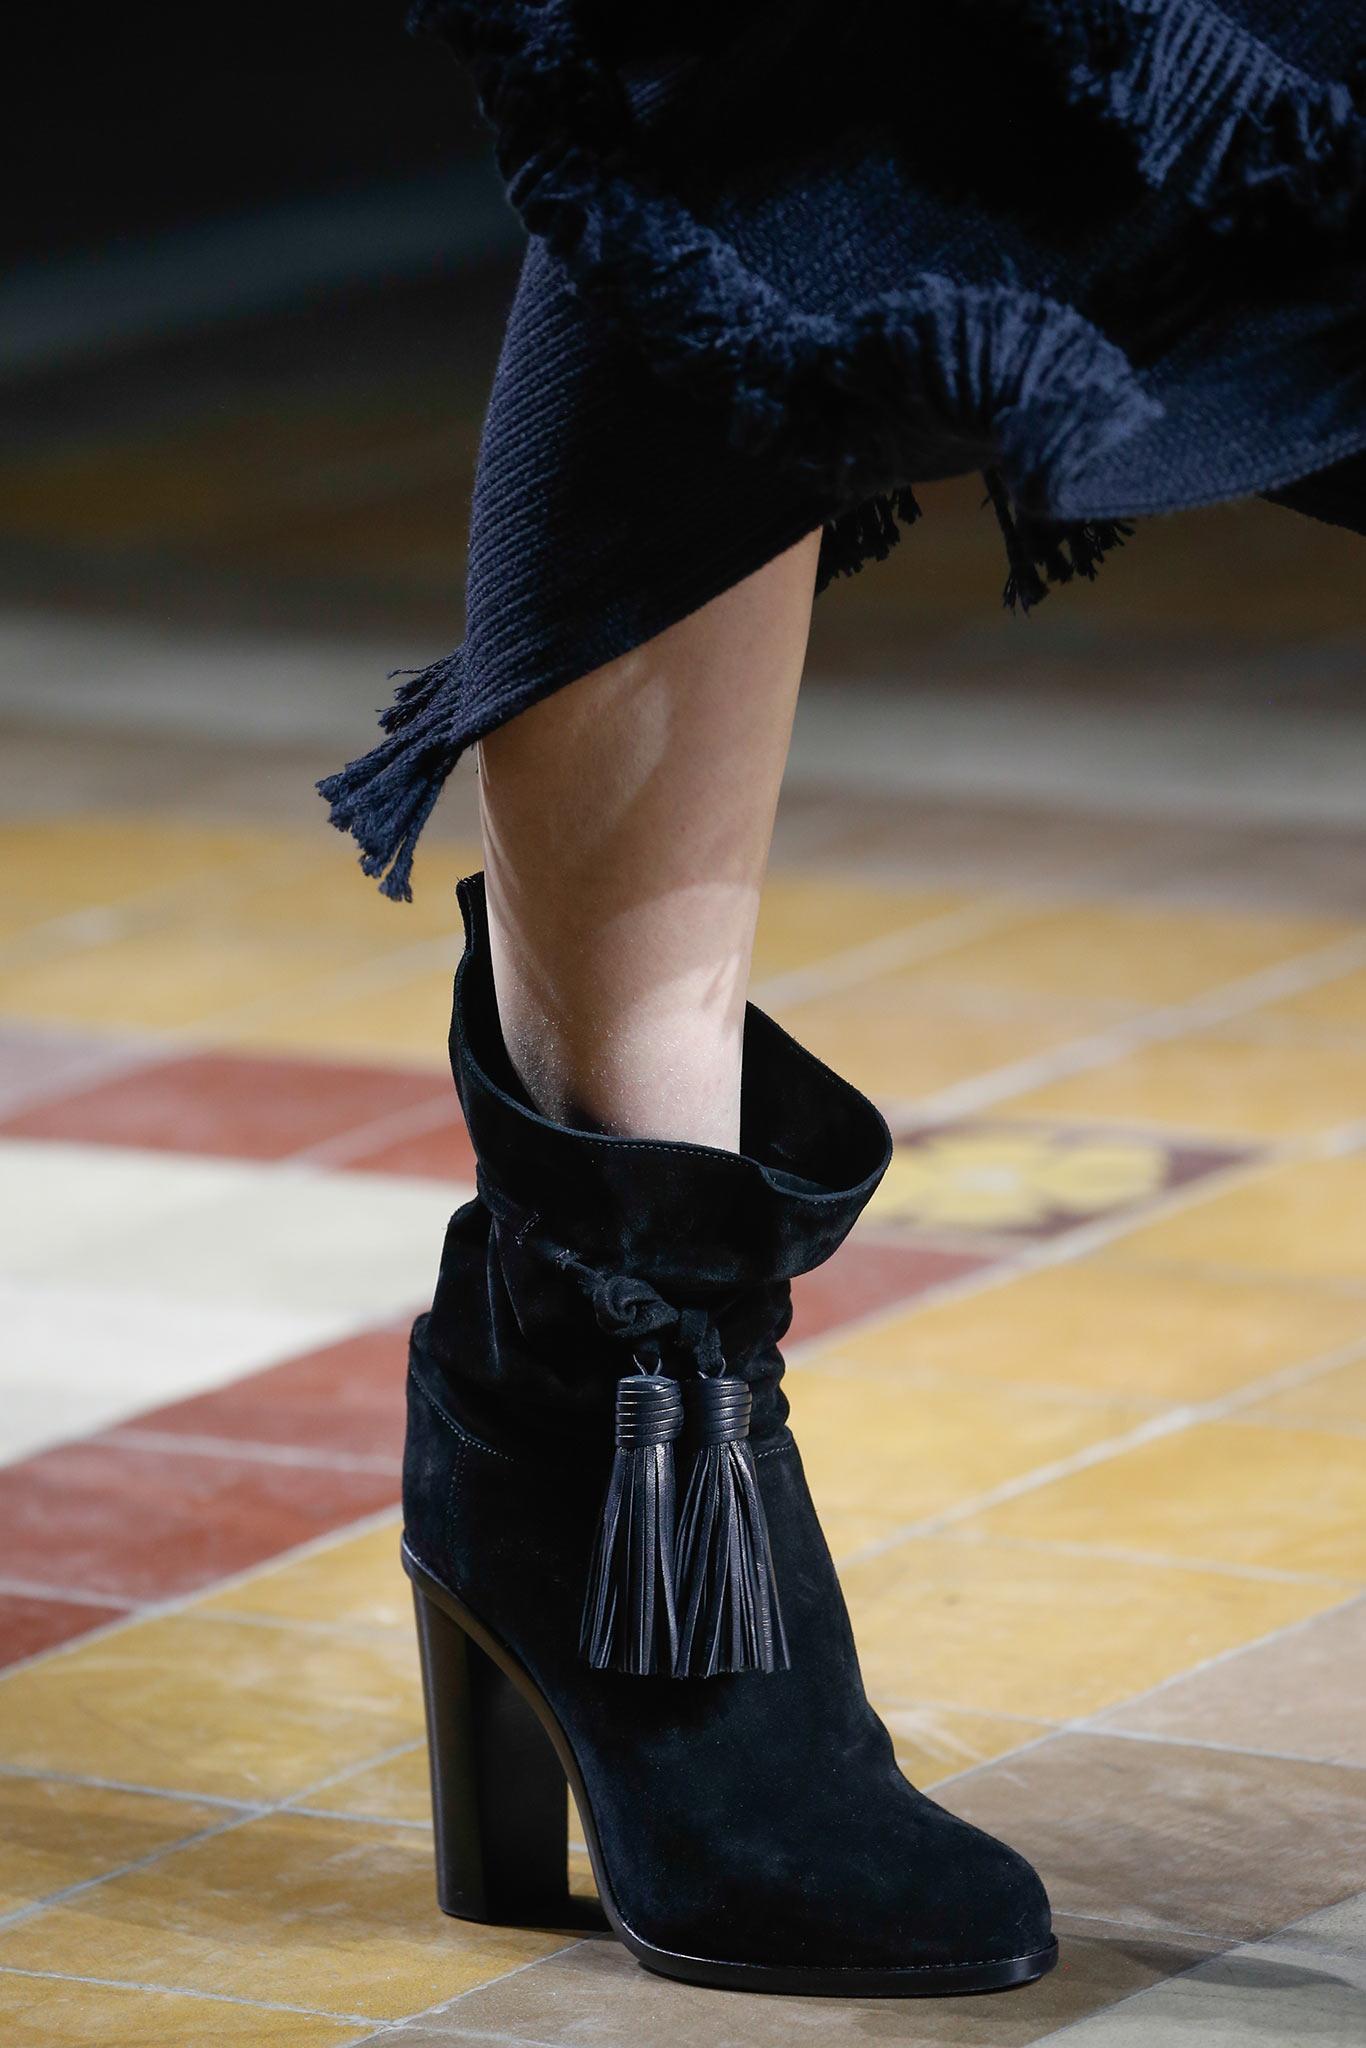 novinki-modnoj-zimnej-zhenskoj-obuvi-9